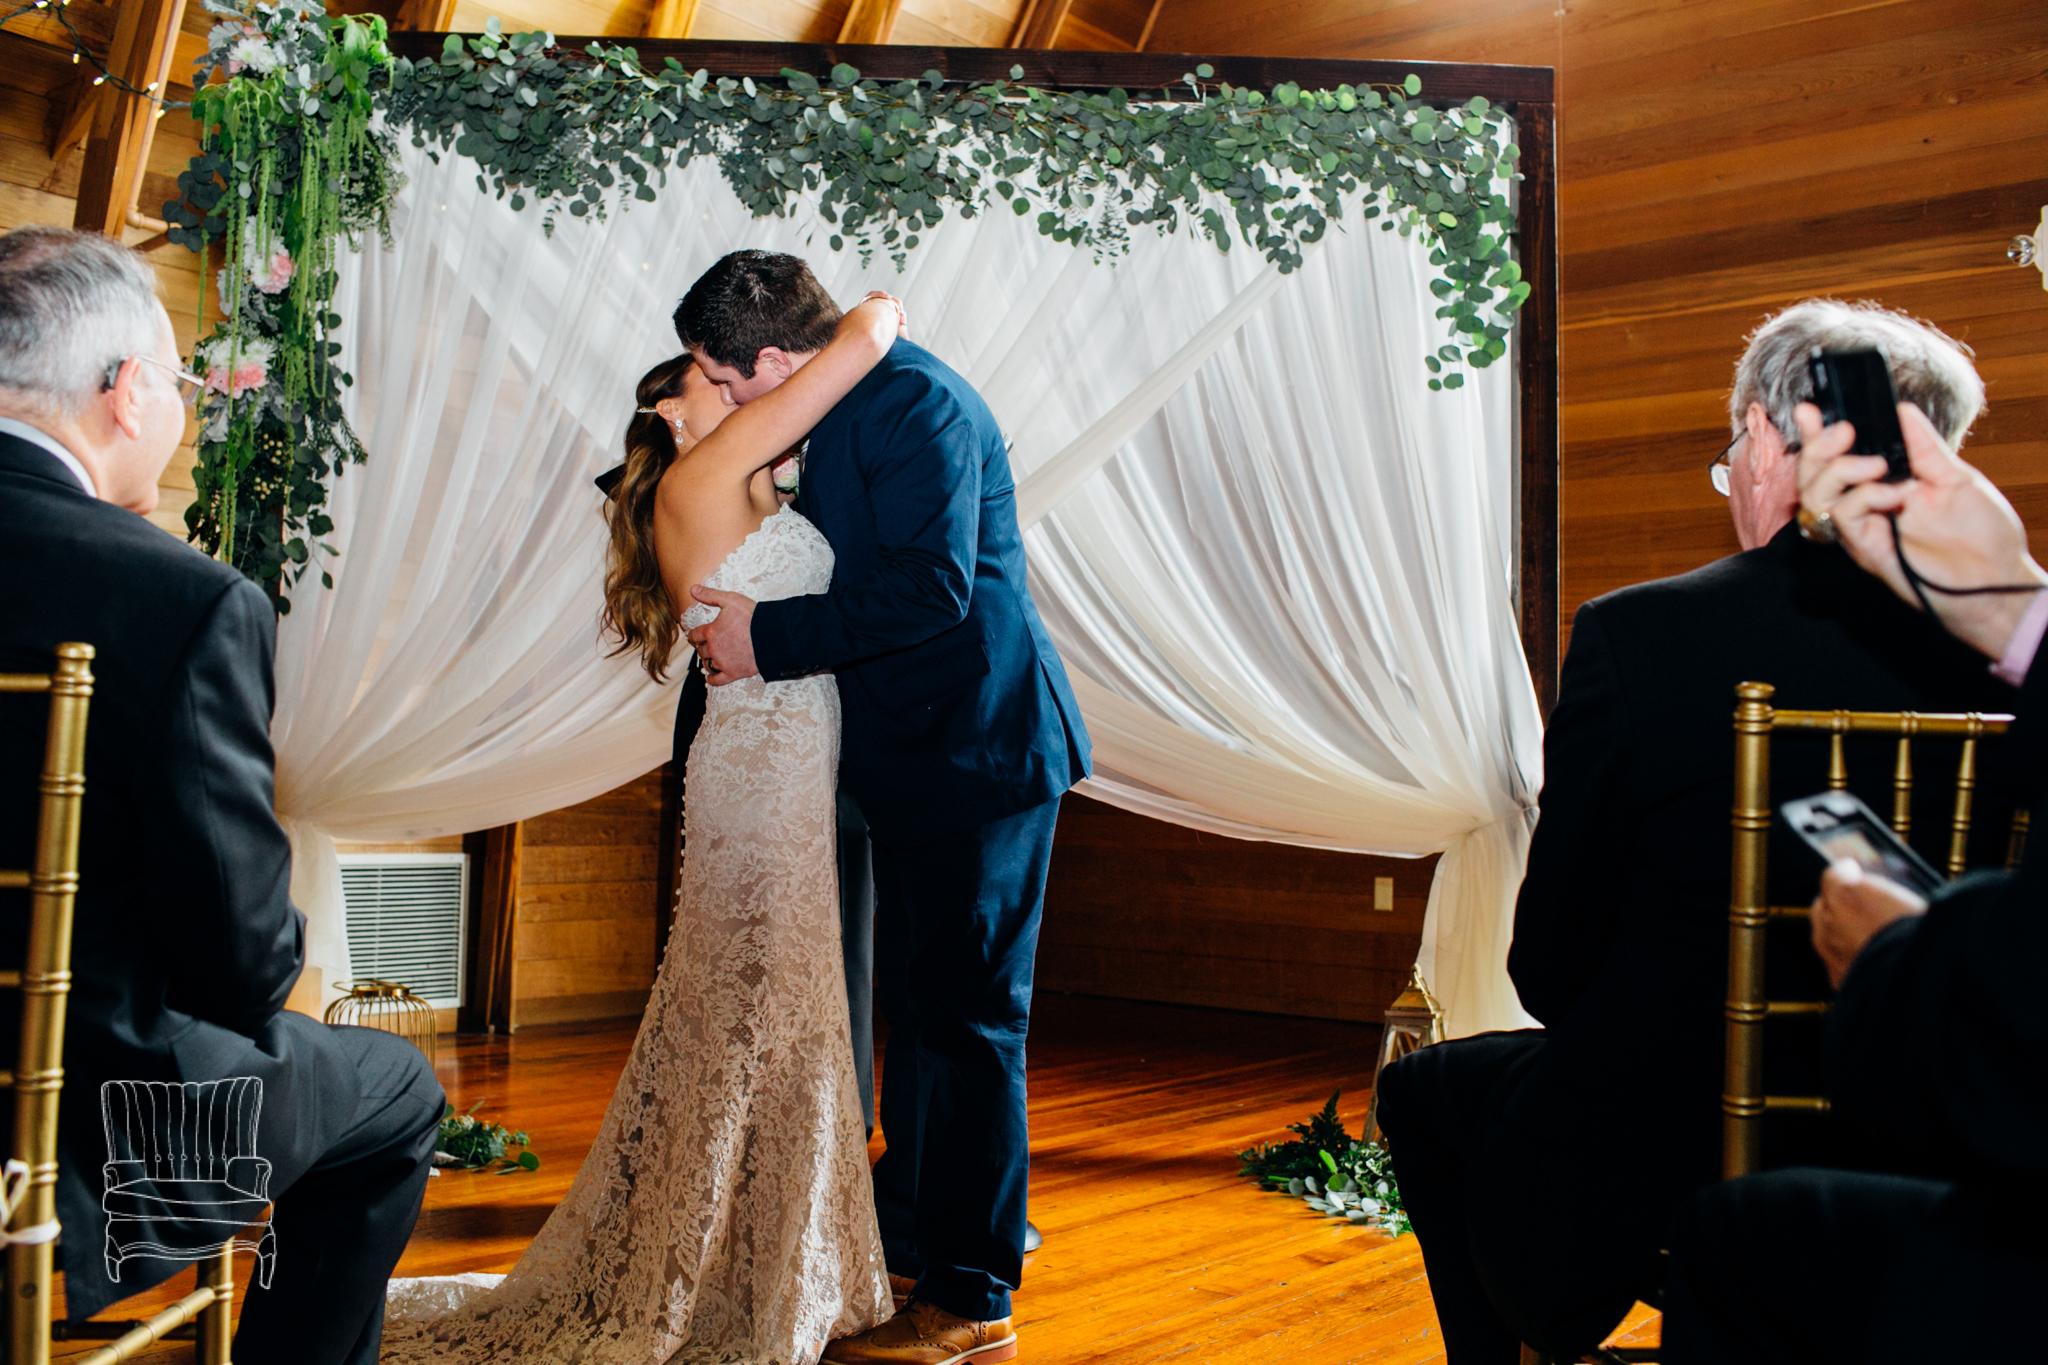 seattle-wedding-photographer-katheryn-moran-russells-bothell-wilkins-wedding-photo-53.jpg